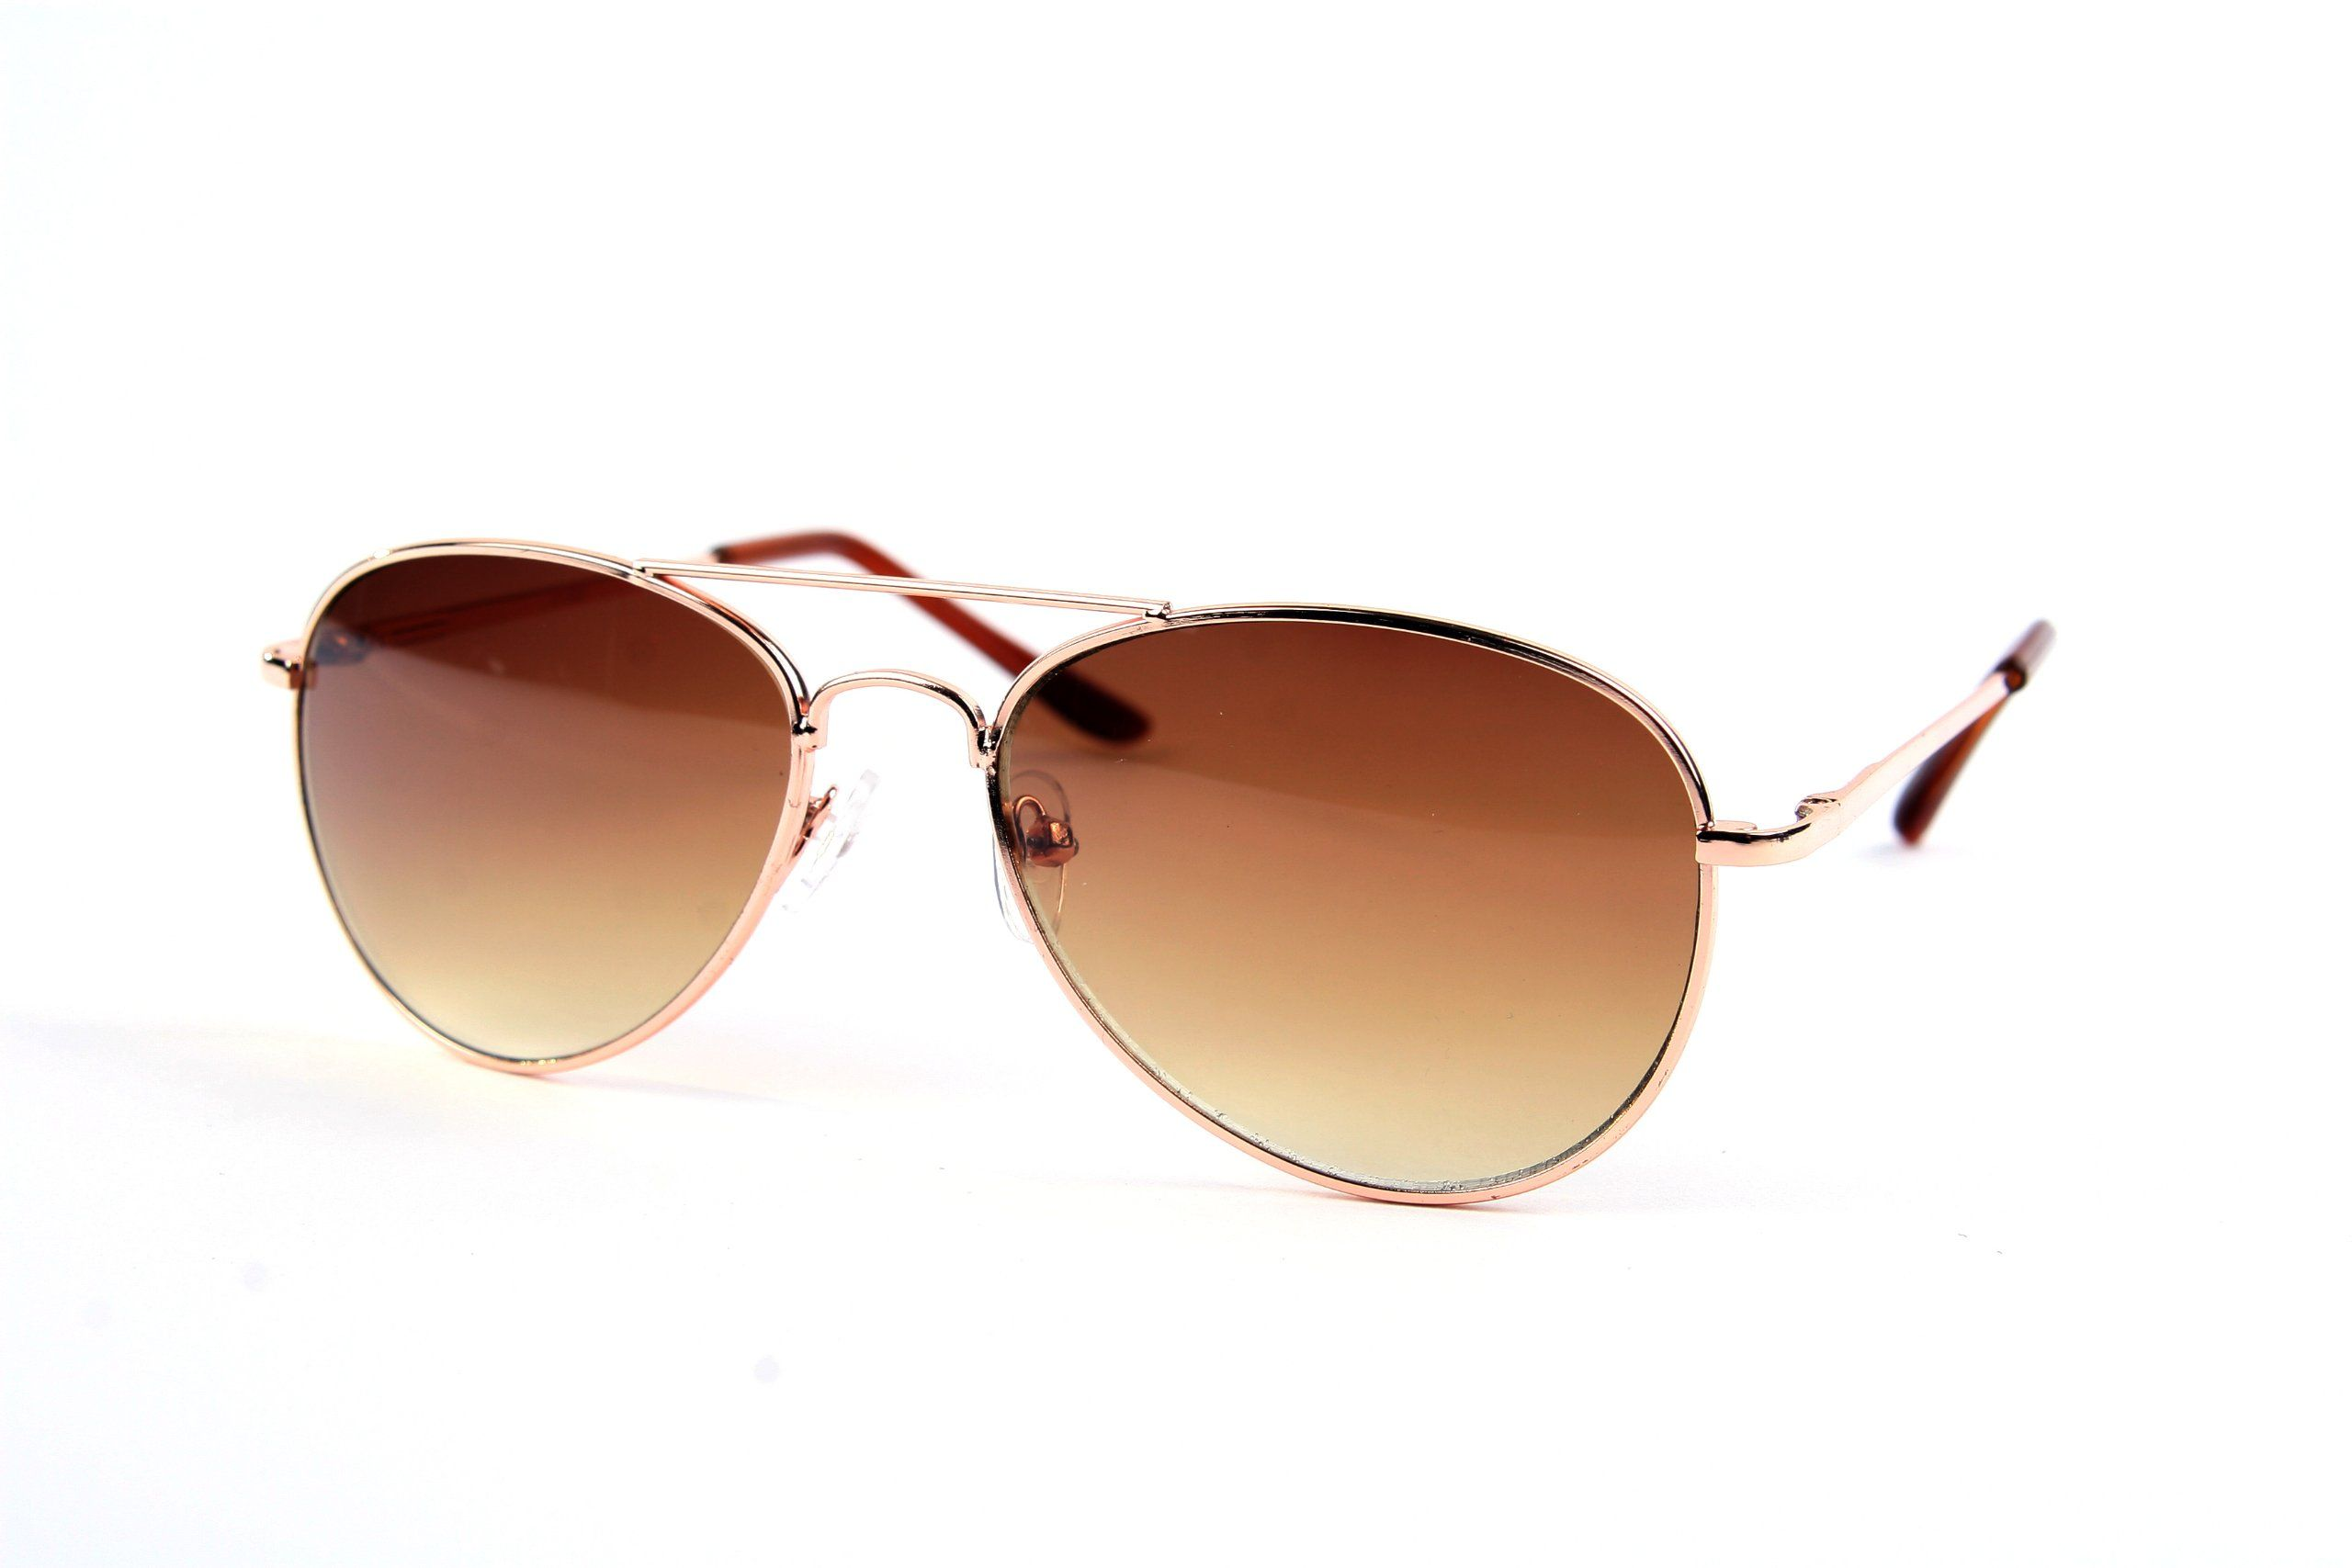 Children Metal Classic Aviator Color Lens Sunglasses P1302 (Gold-Gradient Bro. Children Metal Classic Aviator Color Lens Sunglasses P1302.